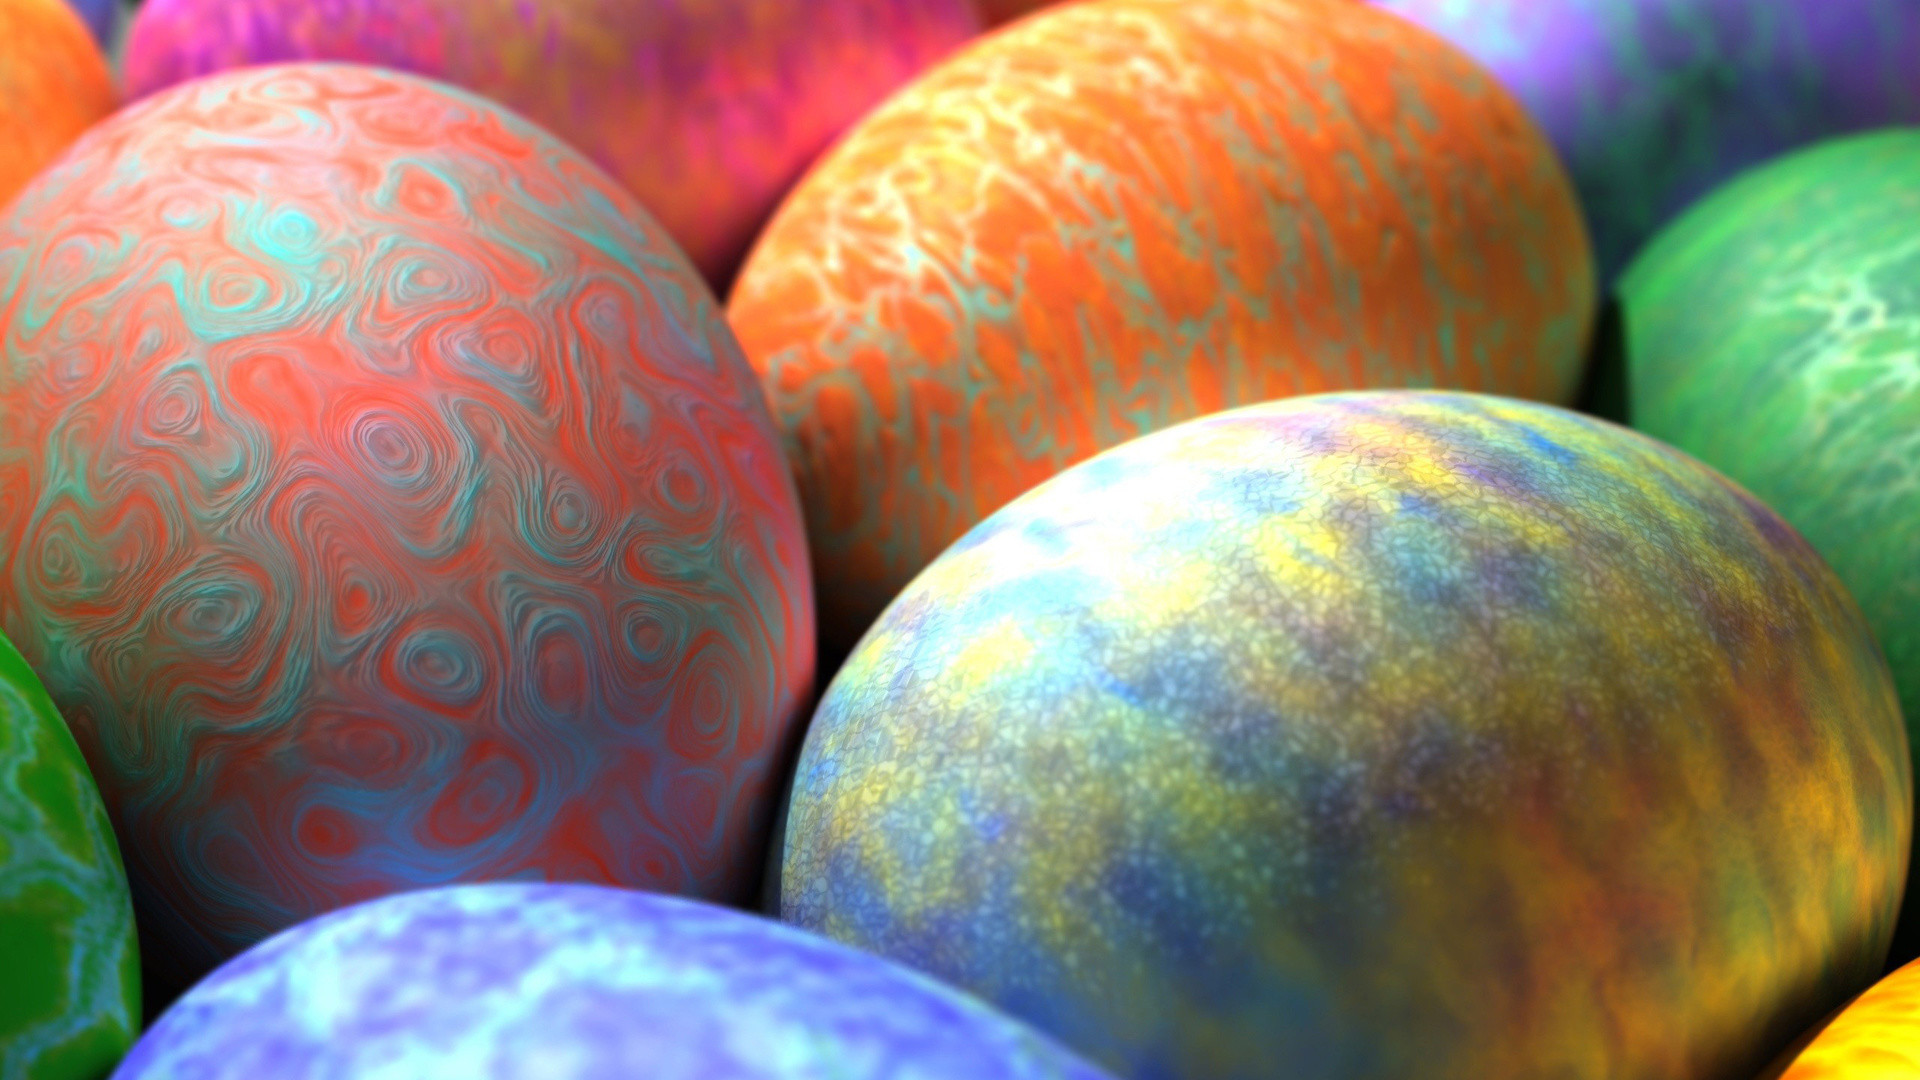 Desktop easter wallpaper wallpapertag - Easter desktop wallpaper ...